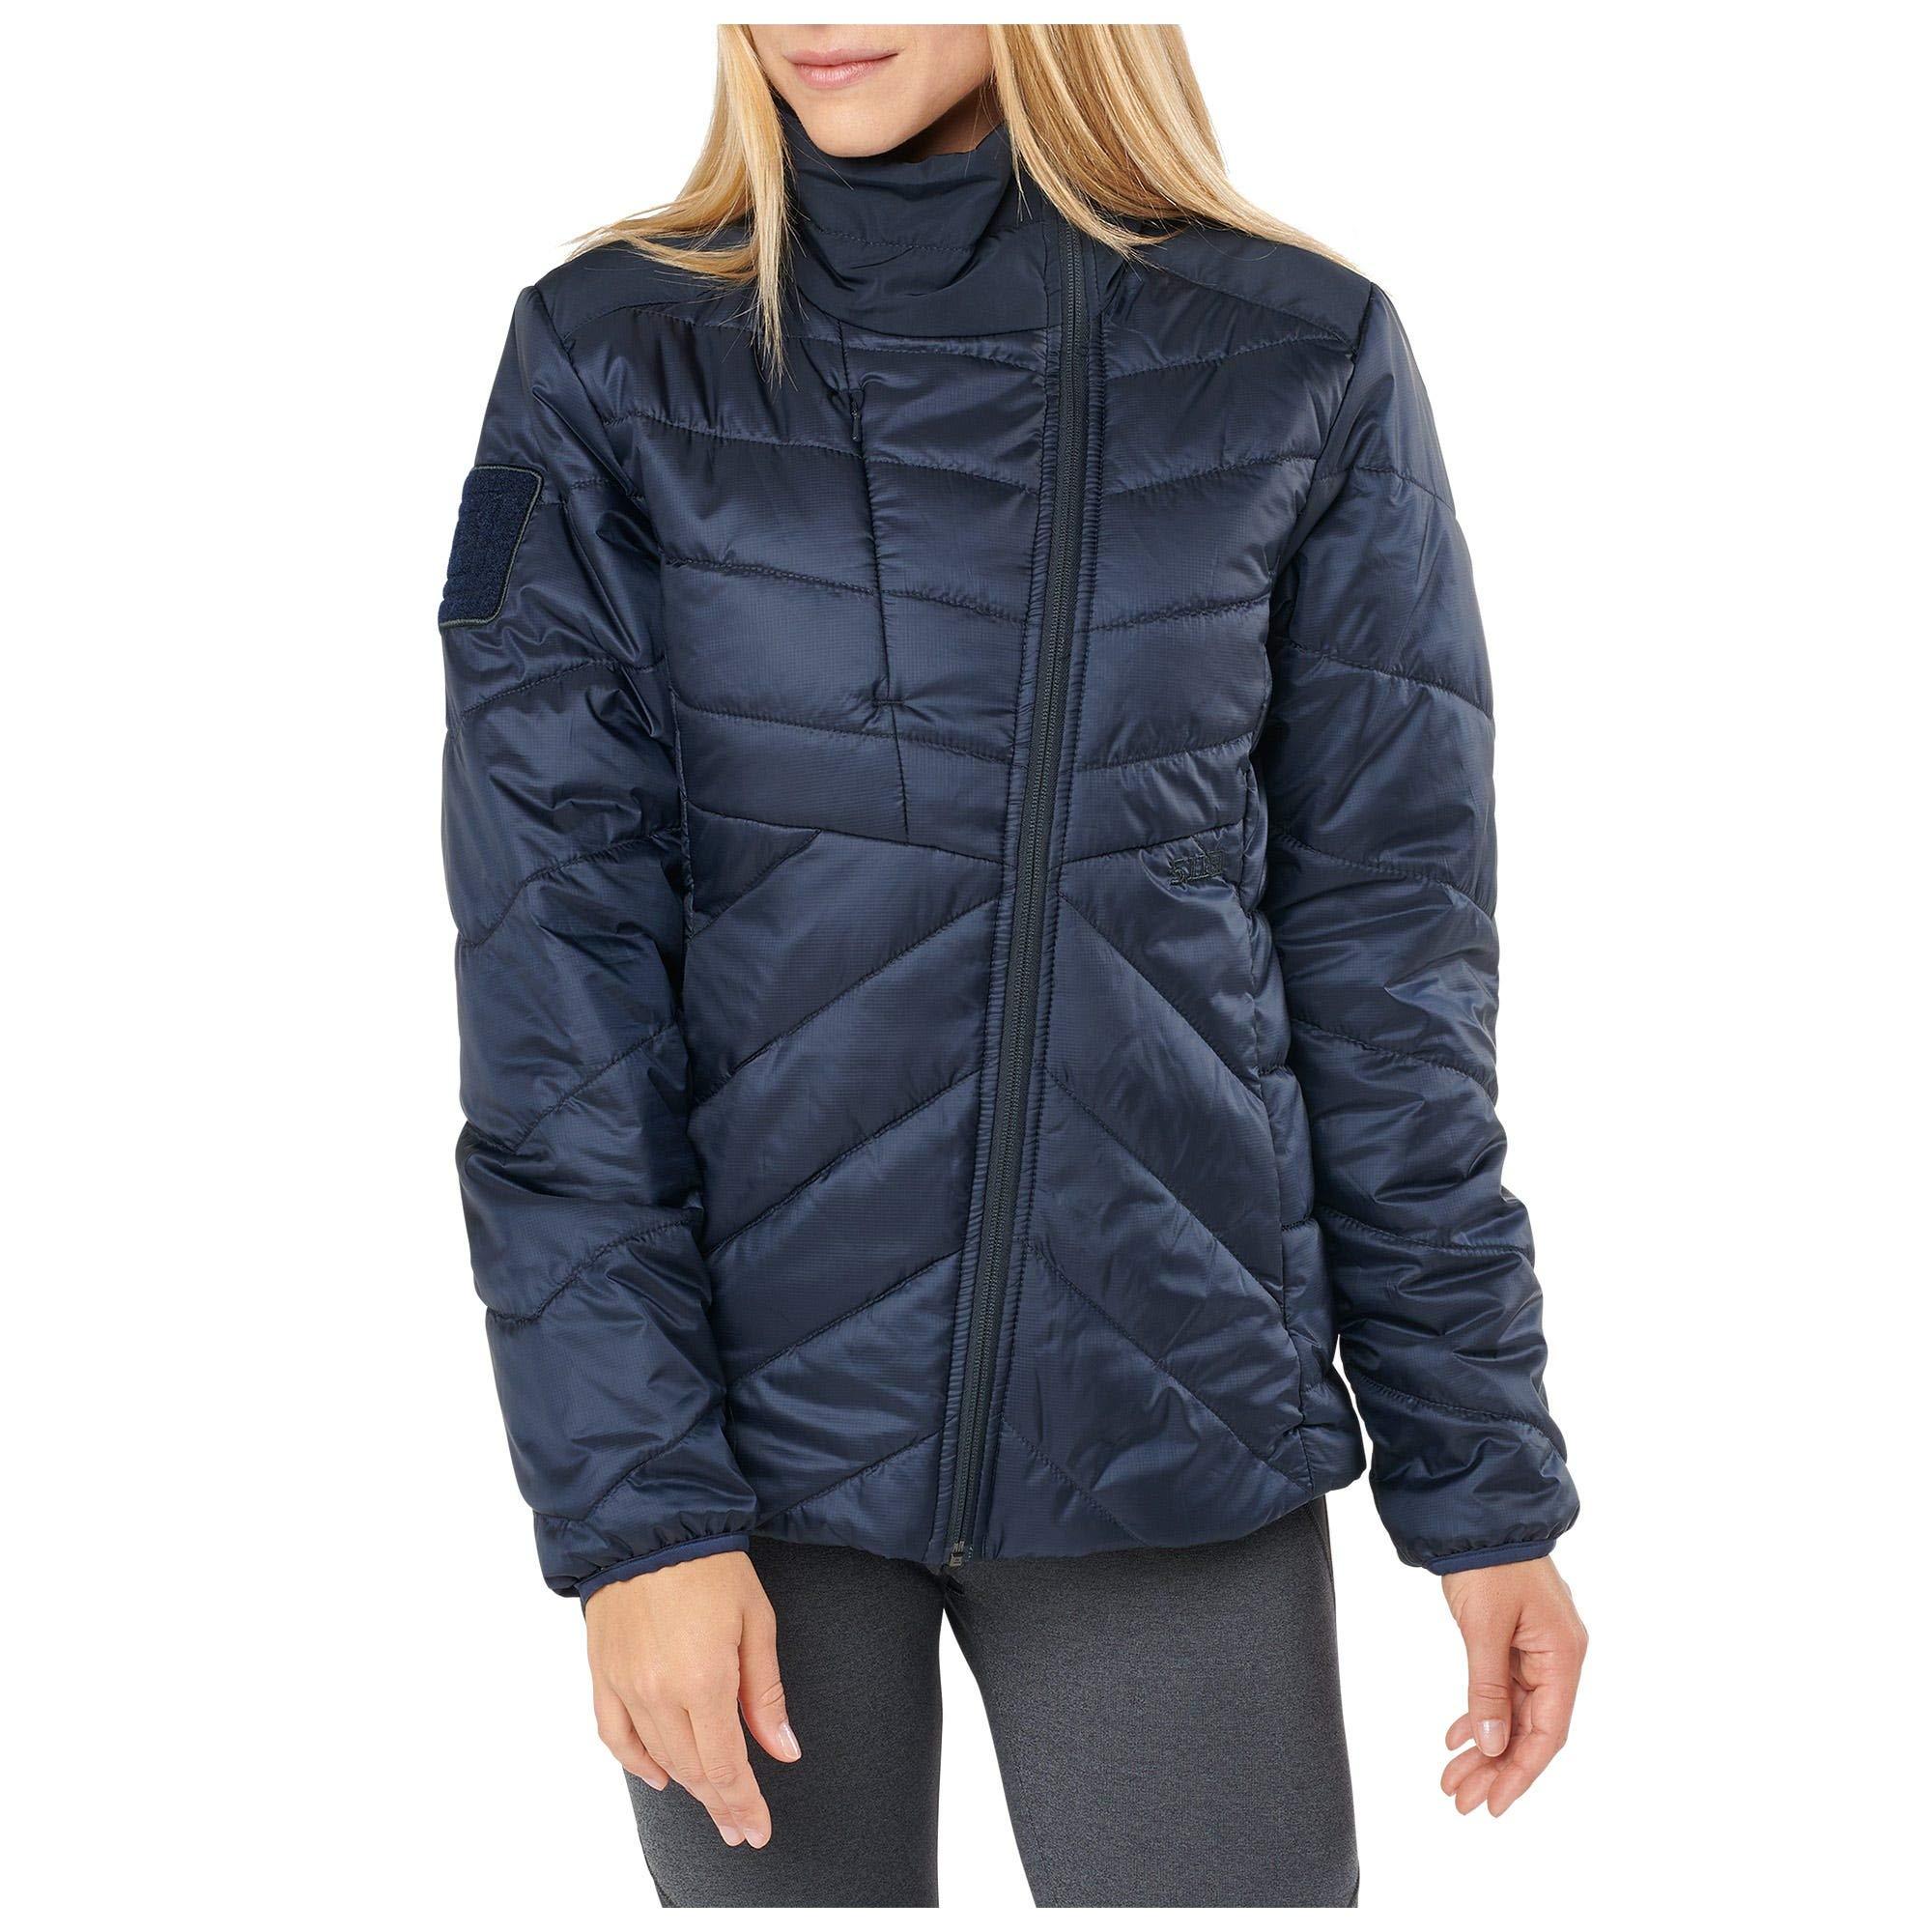 5.11 Tactical Women's Peninsula Insulator Packable Jacket, Peacoat, S, 38076 by 5.11